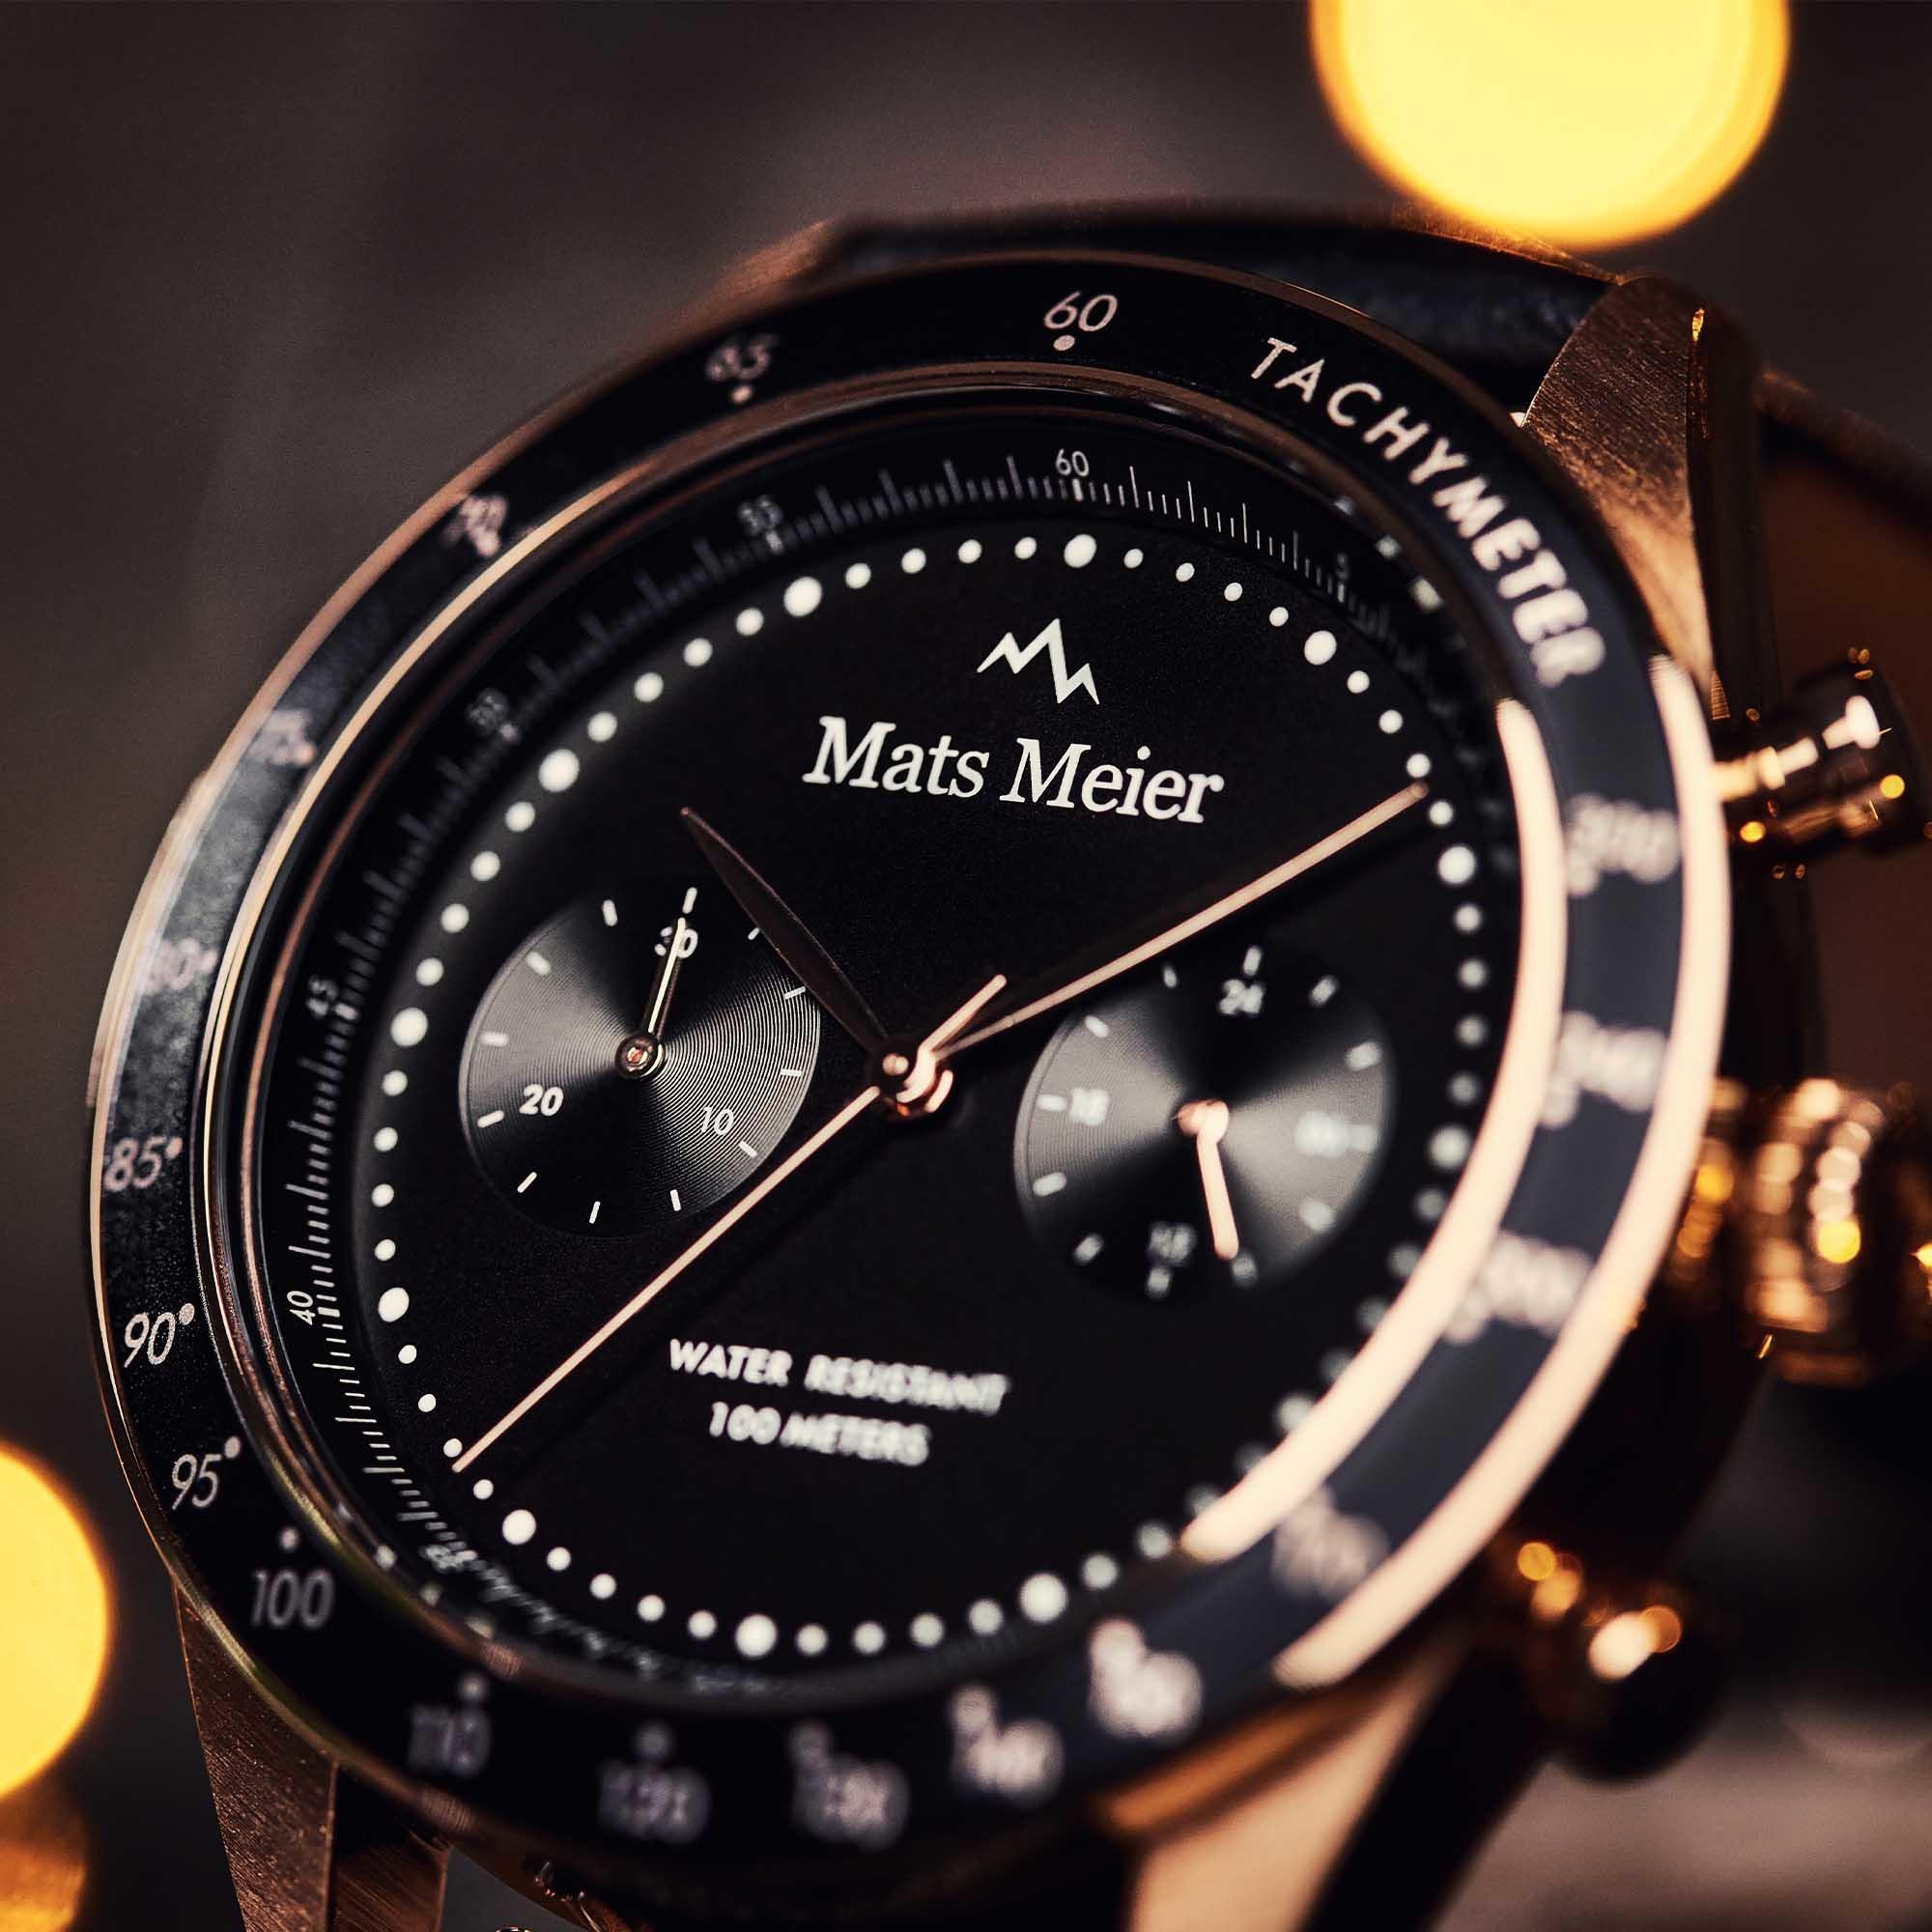 Mats Meier Arosa Racing Chronograph Schwarz